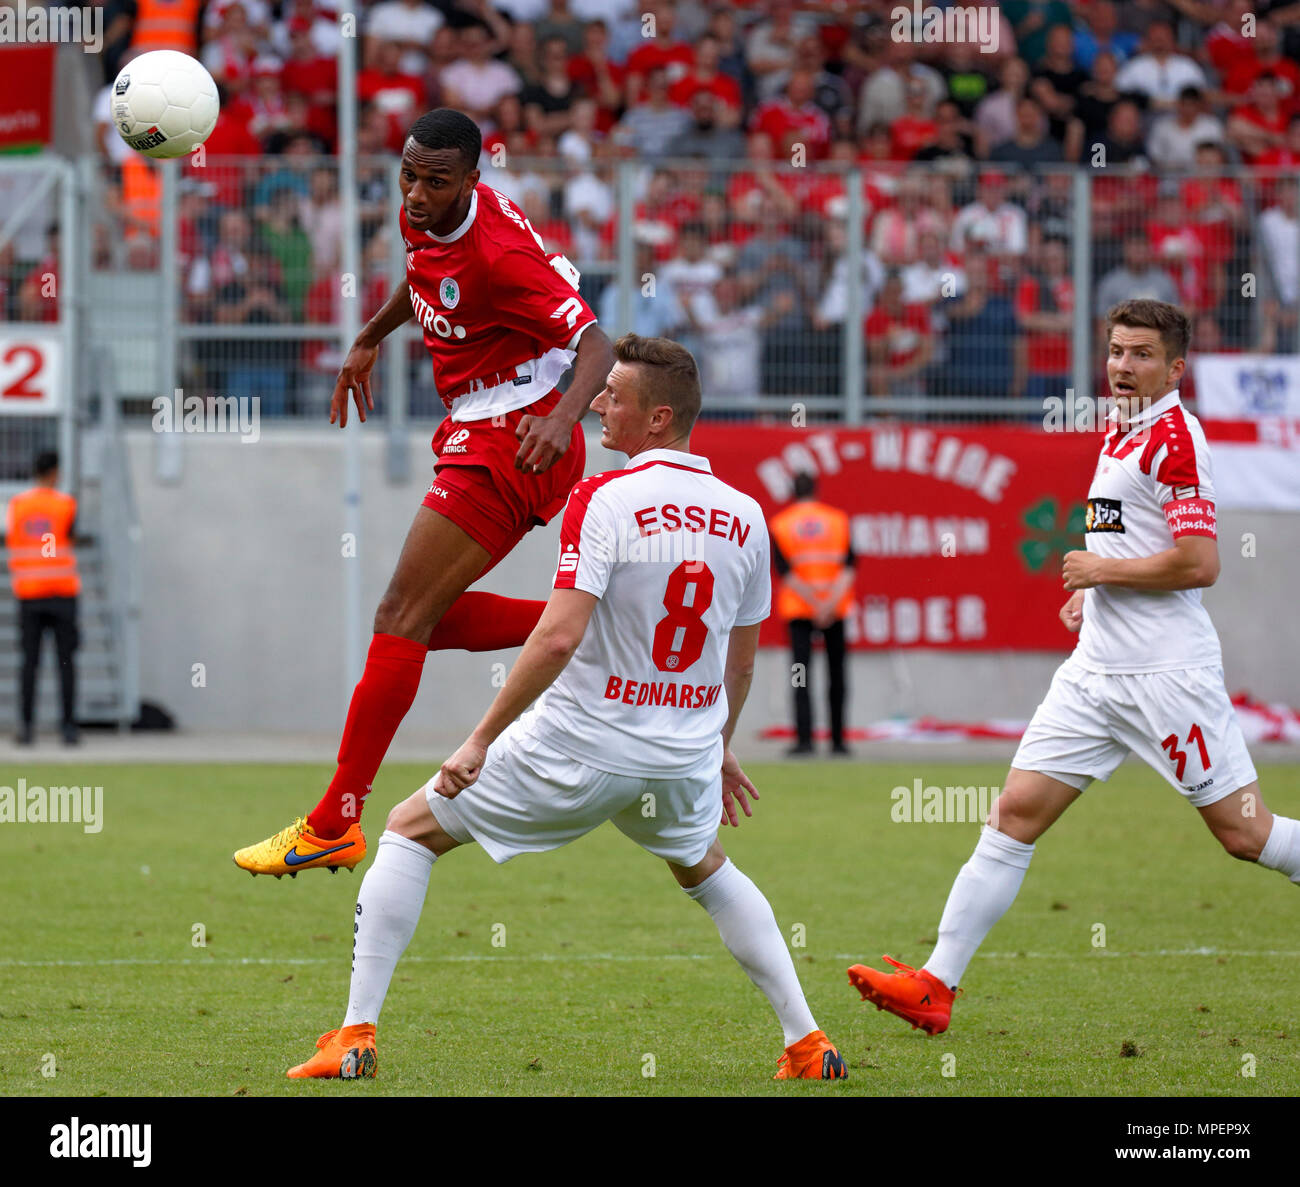 sports, football, Lower Rhine Cup, 2017/2018, final, Rot-Weiss Oberhausen vs Rot Weiss Essen 2:1, Stadium Niederrhein Oberhausen, scene of the match, f.l.t.r. Yassin Ben Balla (RWO), Kamil Bednarski (RWE), team captain Benjamin Baier (RWE) - Stock Image